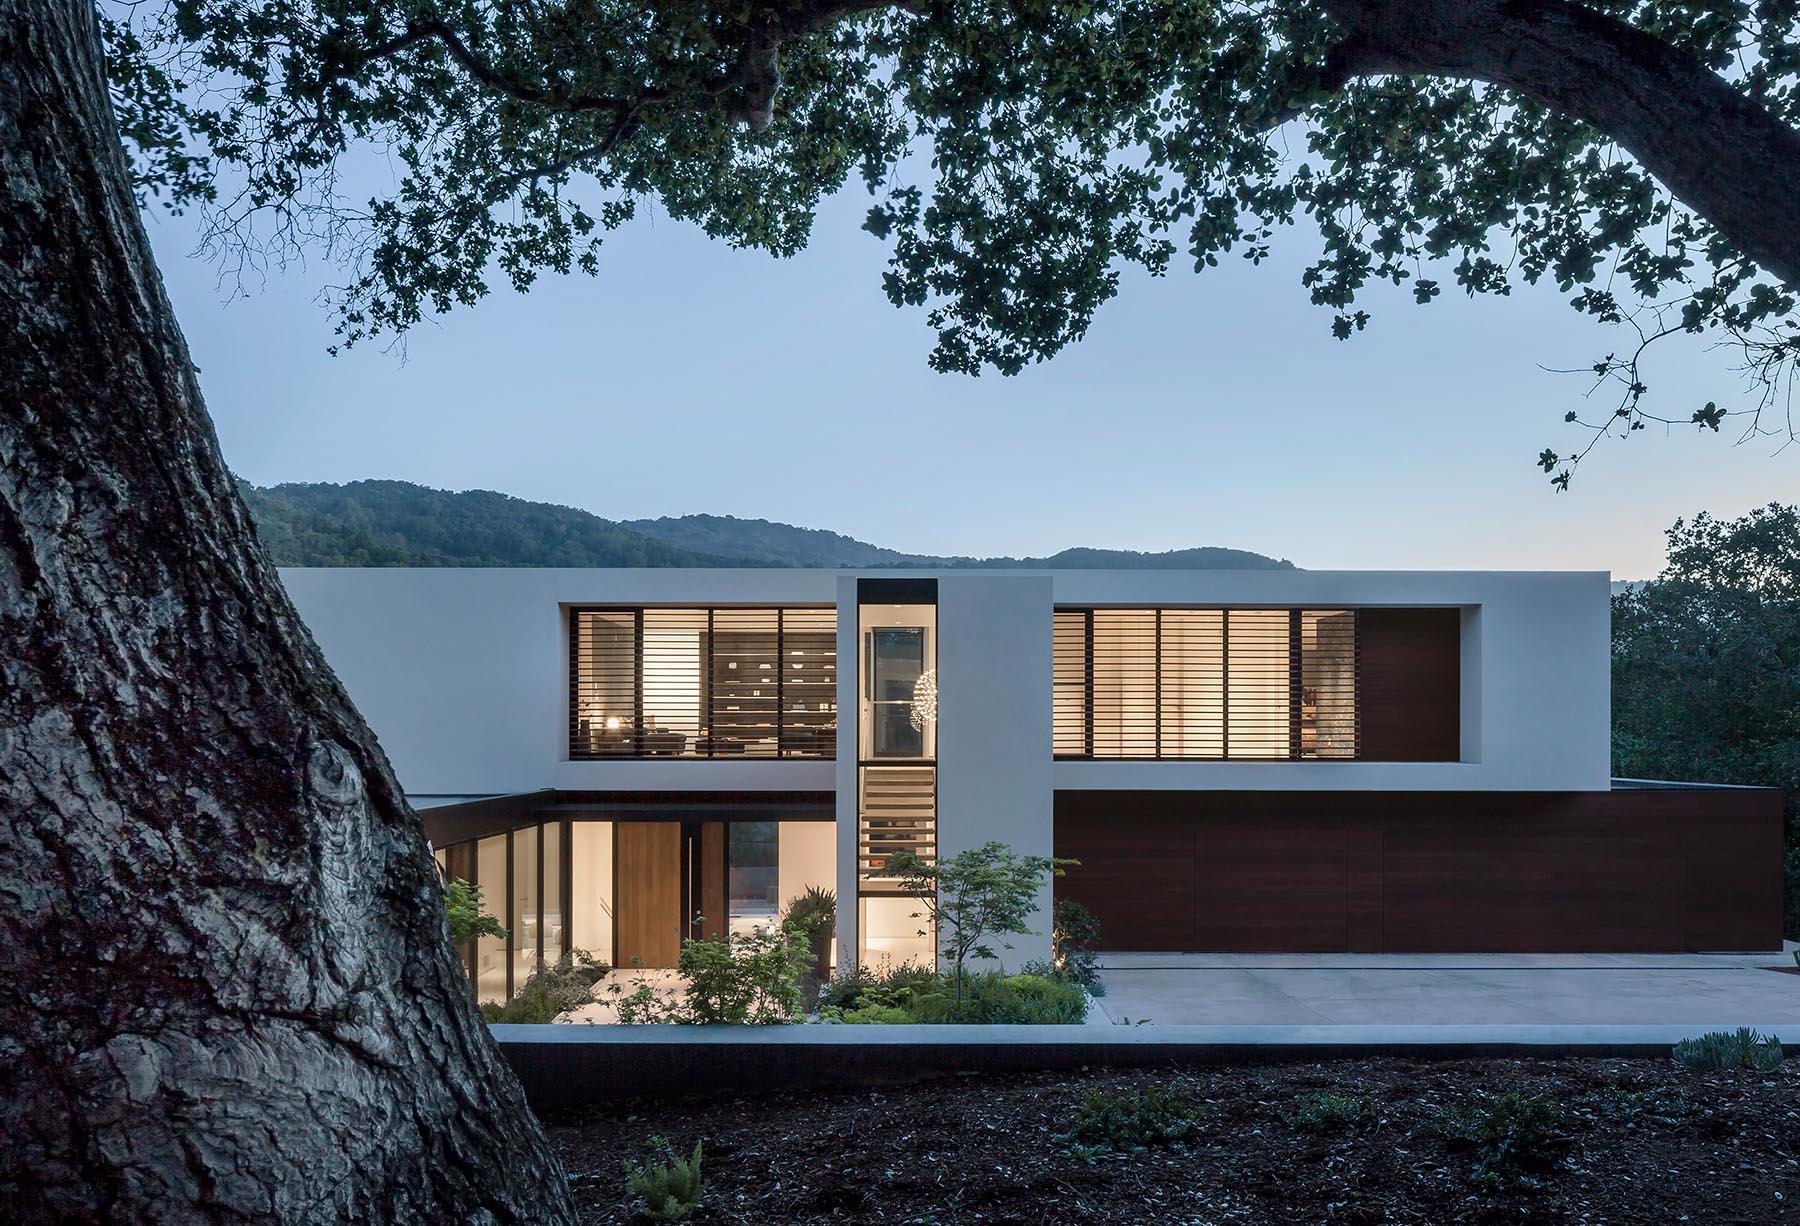 kuće koje nam se sviđaju.. - Page 5 Modern-house-white-exterior-261020-800-01-ZcxPAA